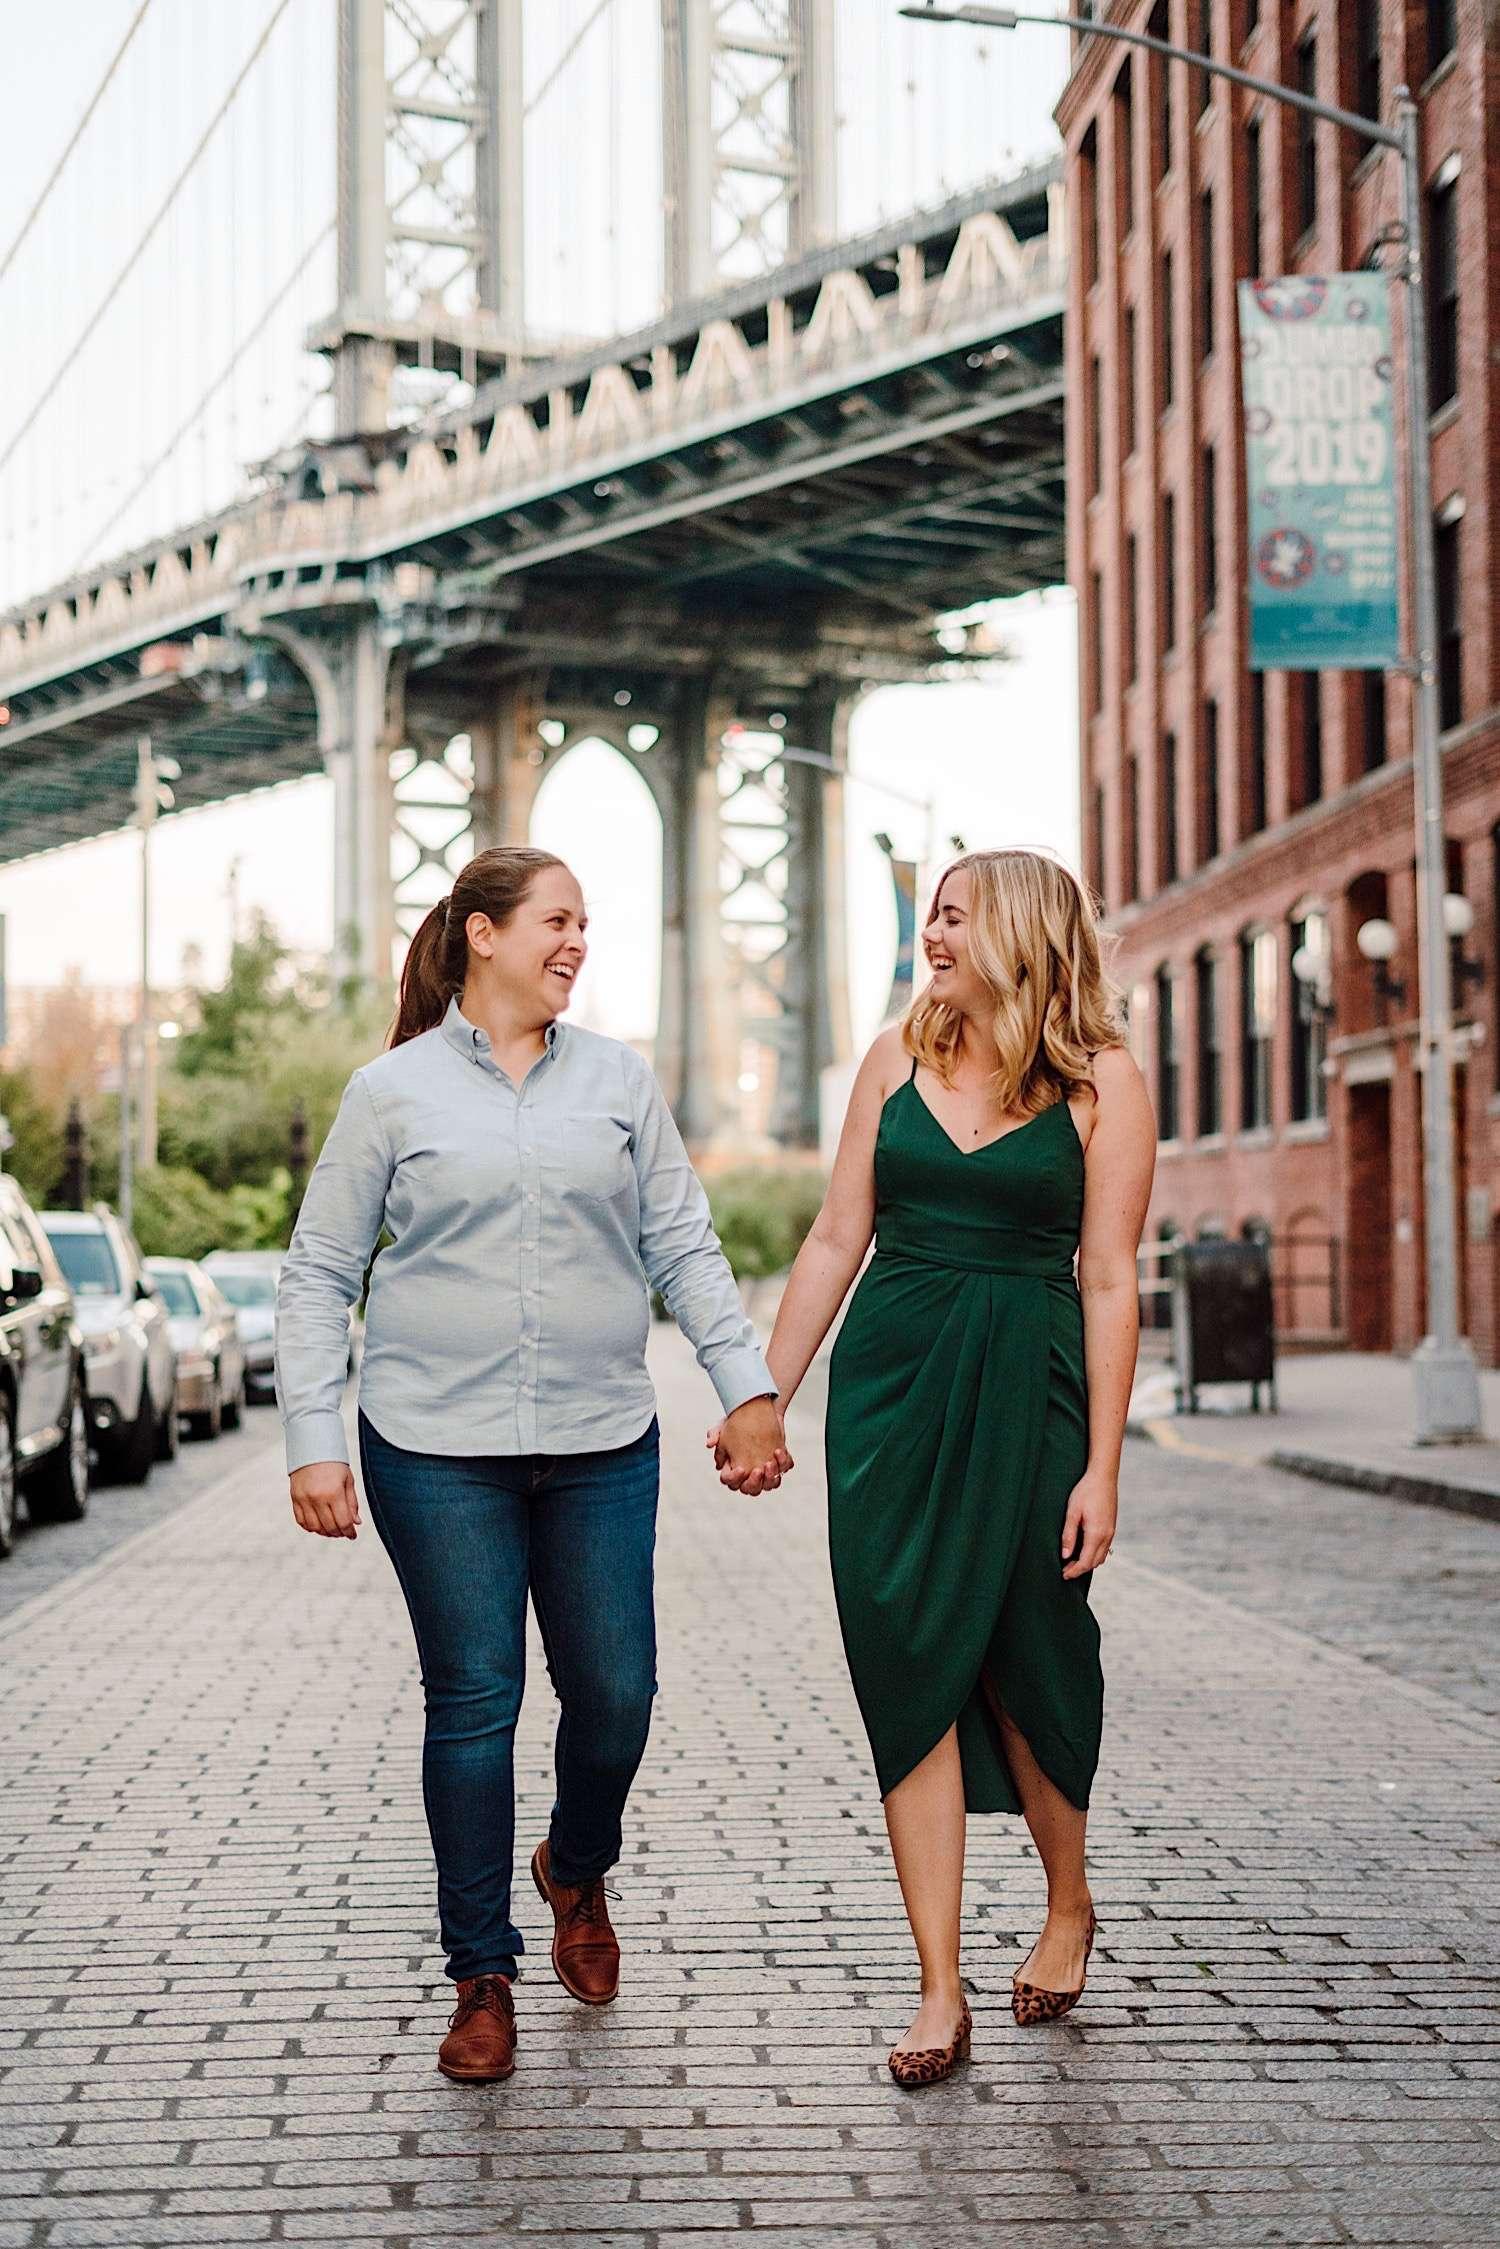 NYC LGBT Wedding Photographer, DUMBO engagement session gallery, LGBT Wedding Photographer, NYC Gay Wedding Photographer, DUMBO Engagement Photos